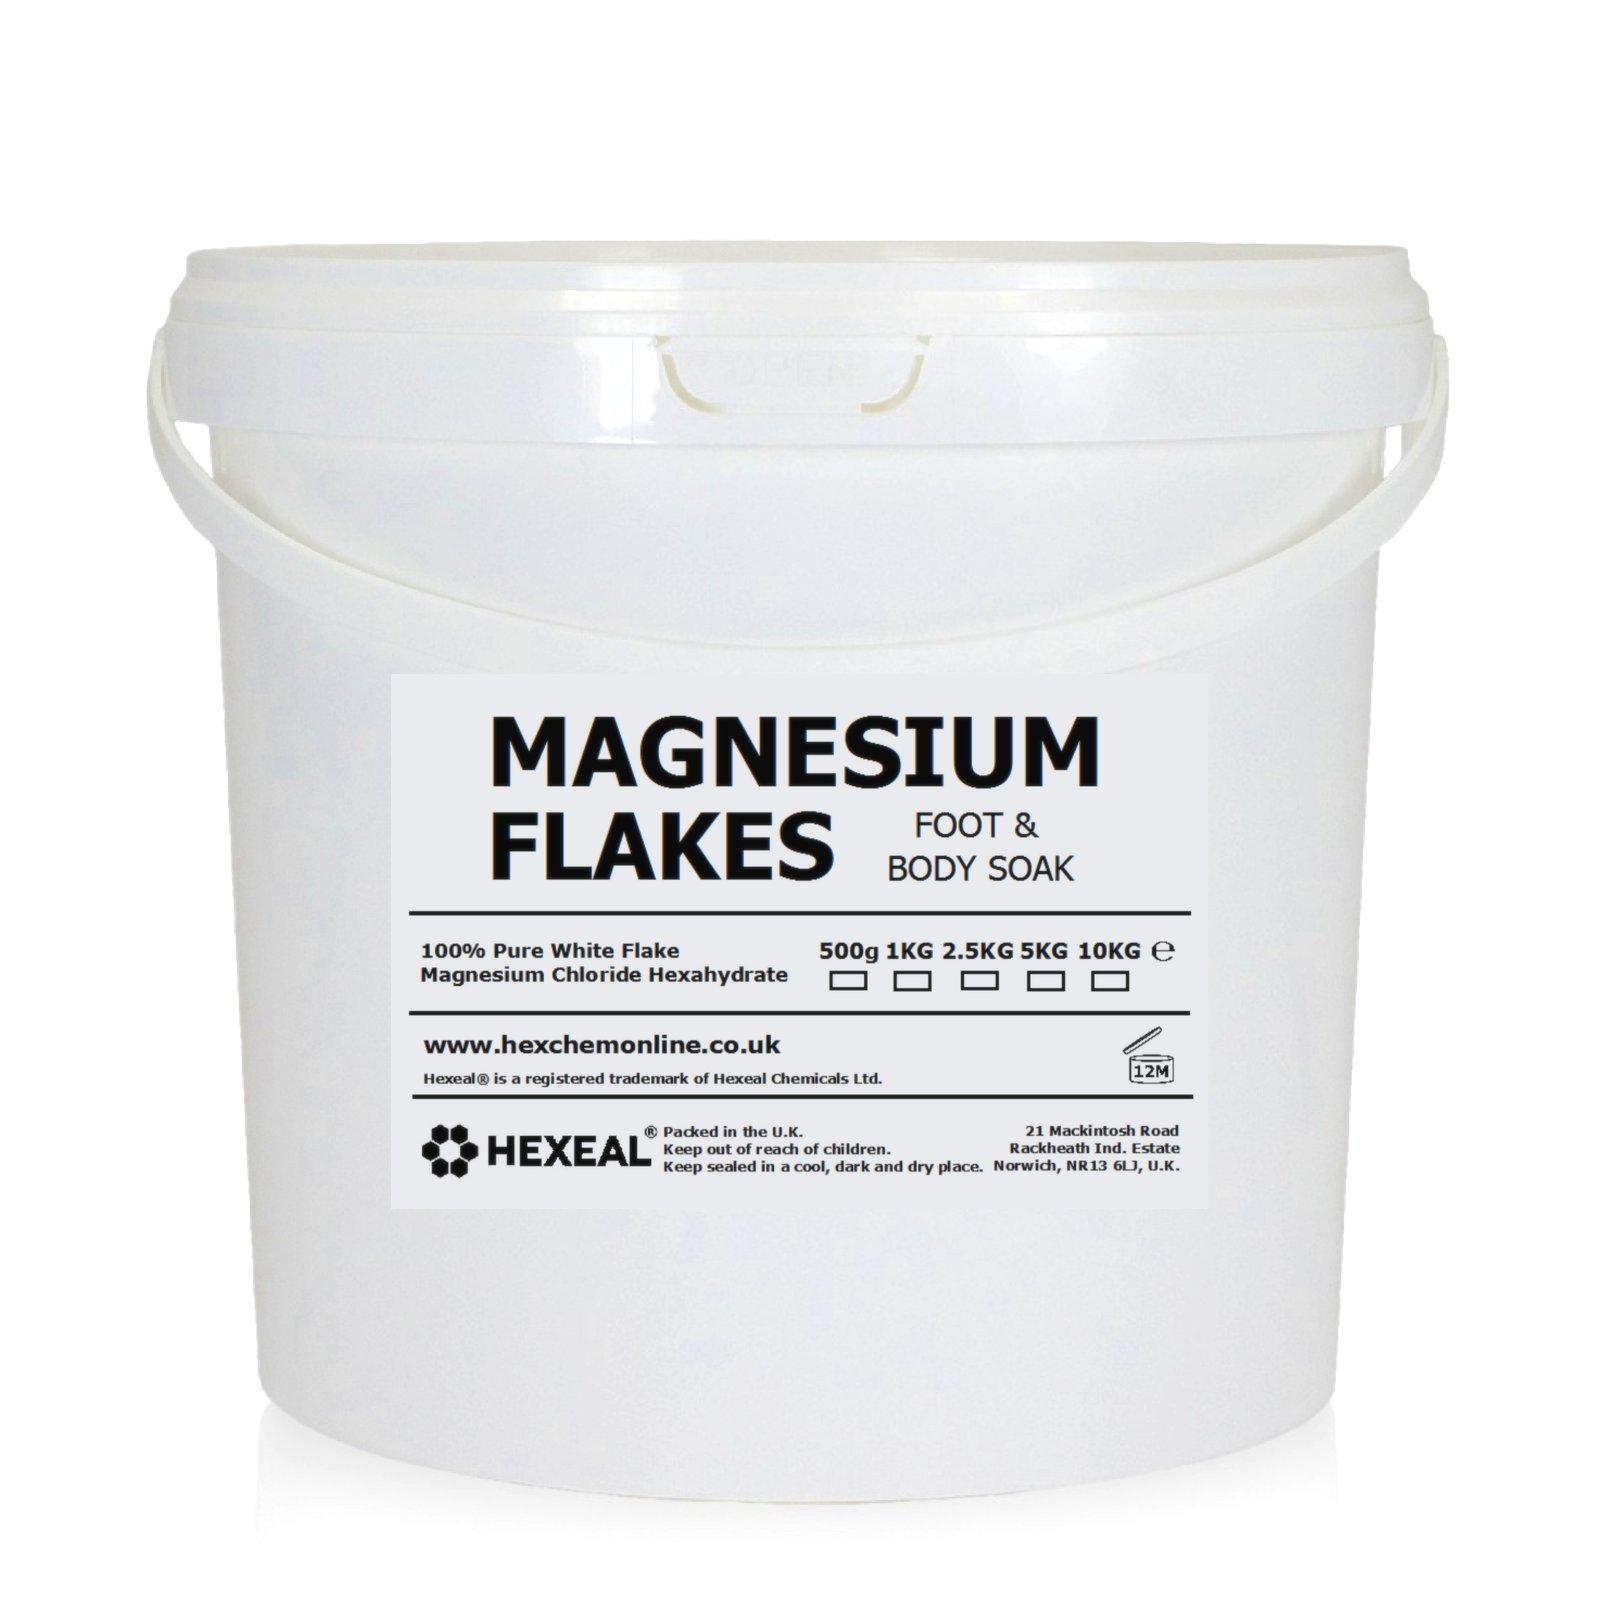 MAGNESIUM FLAKES | 10KG BUCKET | 100% Pure | Bath Soak | Magnesium Chloride